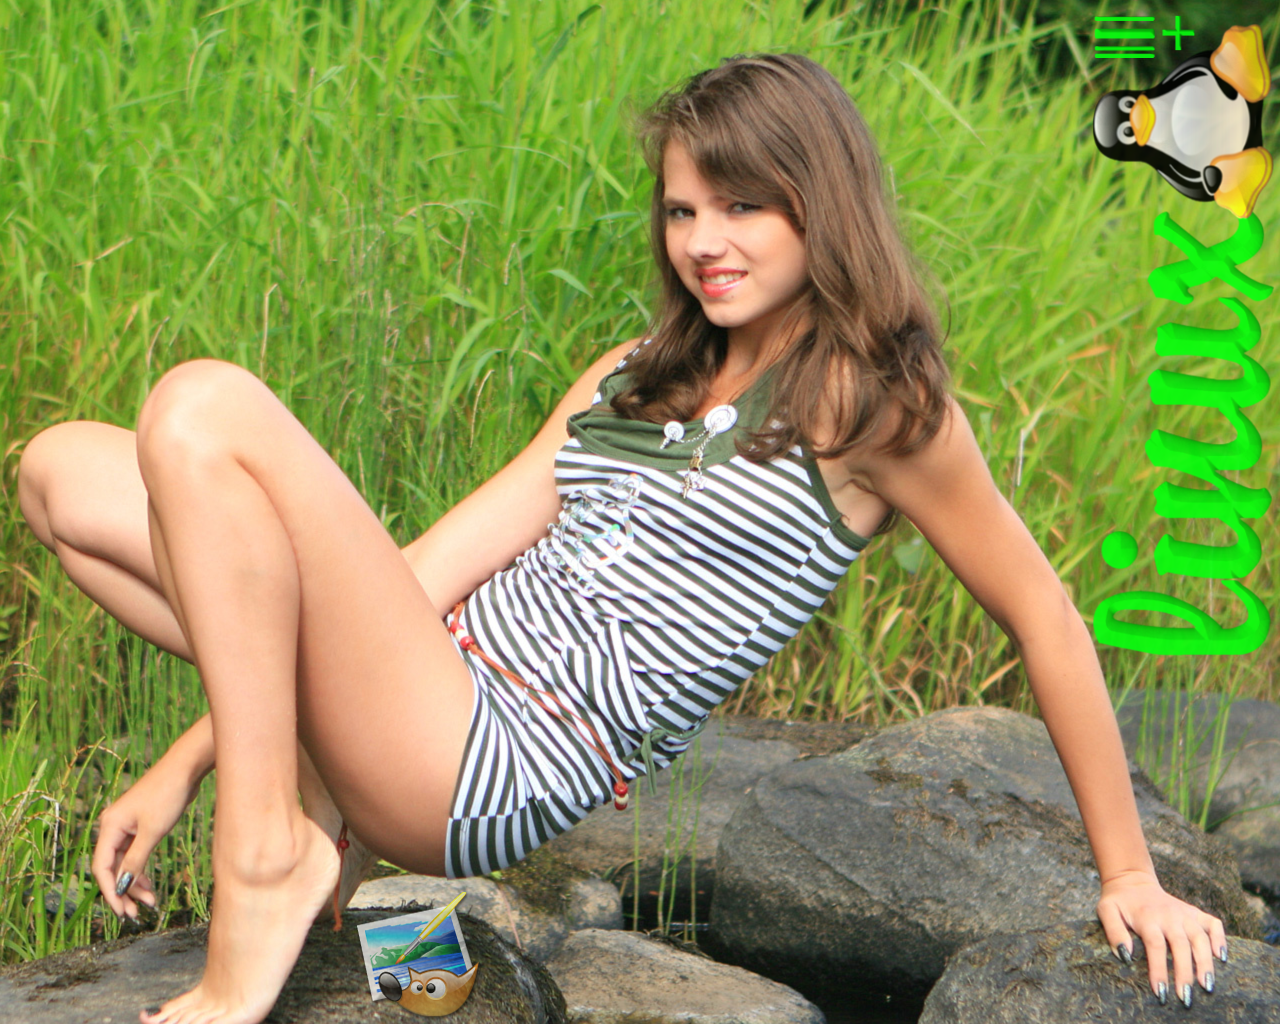 Agree, Imgchili sandra teen model